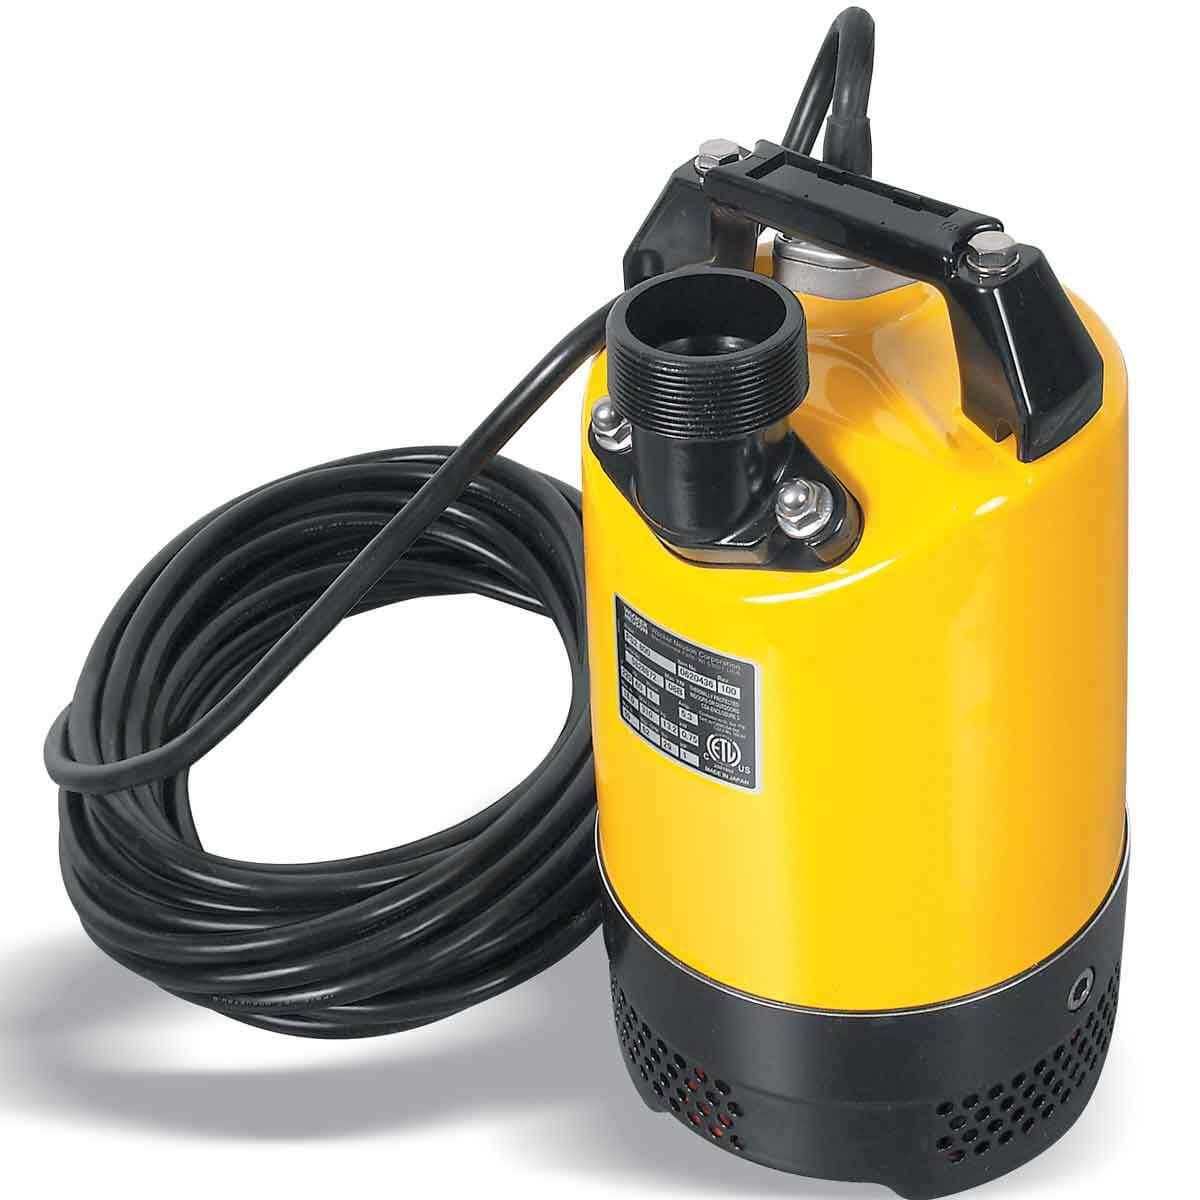 Wacker Neuson PS2 800 50mm/2in Submersible Pump